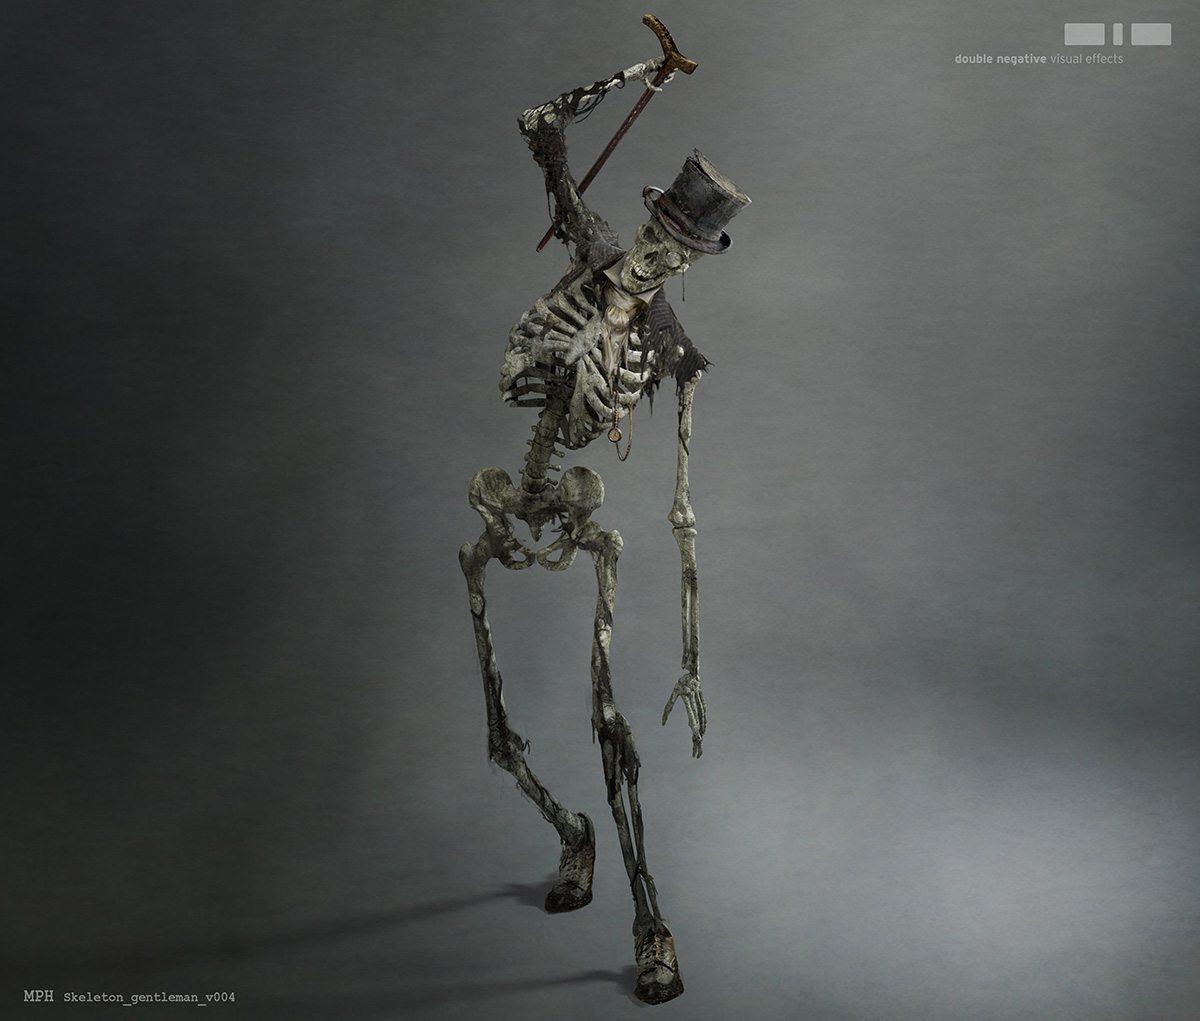 Double Negative's skeleton design for the 'gentleman.'